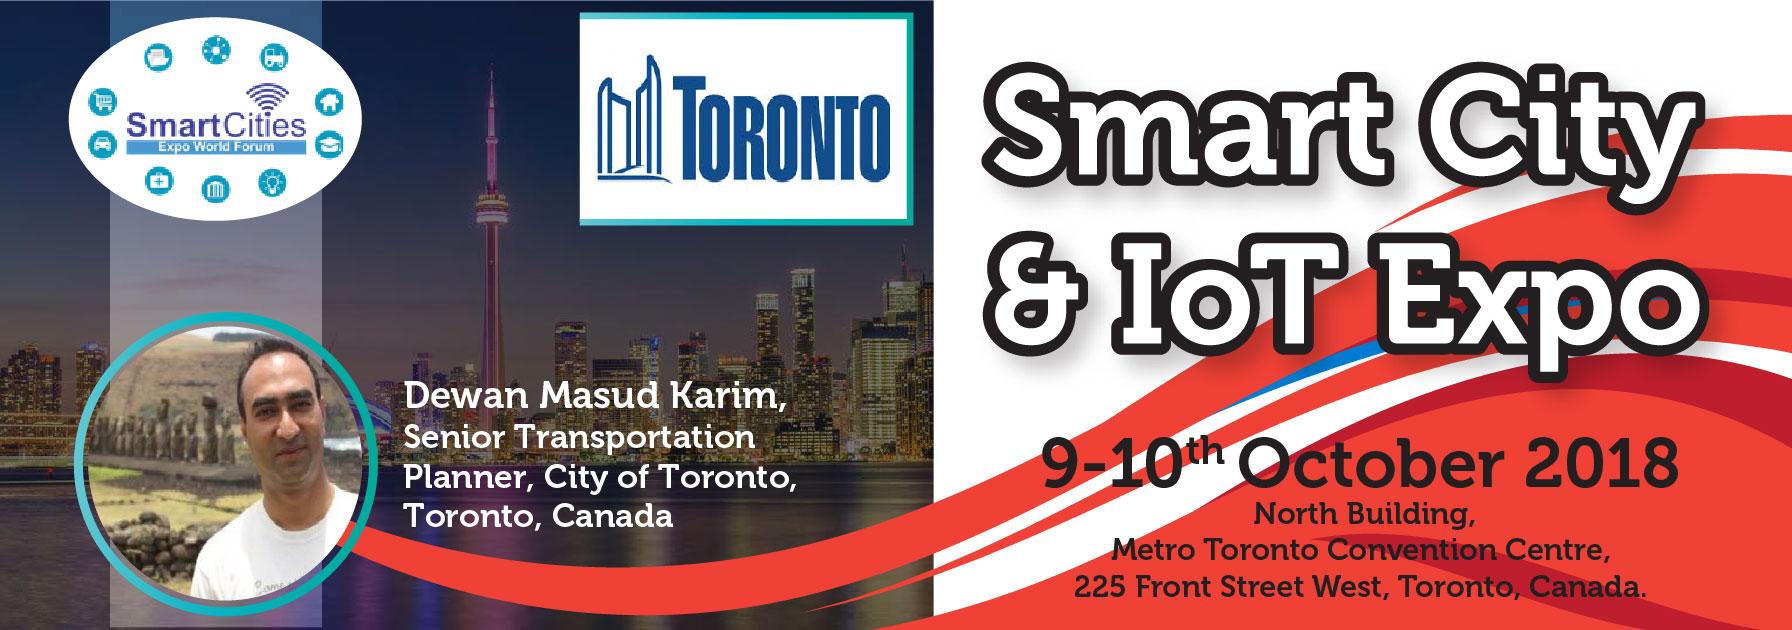 Smart Cities Expo World Forum is pleased to announce the presence of Dewan Masud Karim, Senior Transportation Planner, City of Toronto, Toronto, Canada at Smart City & IoT Expo 9-10 Oct. 2018, Metro Toronto Convention Center, Toronto, Canada. Register Now: www.SmartCitiesExpoWorldForum.ca